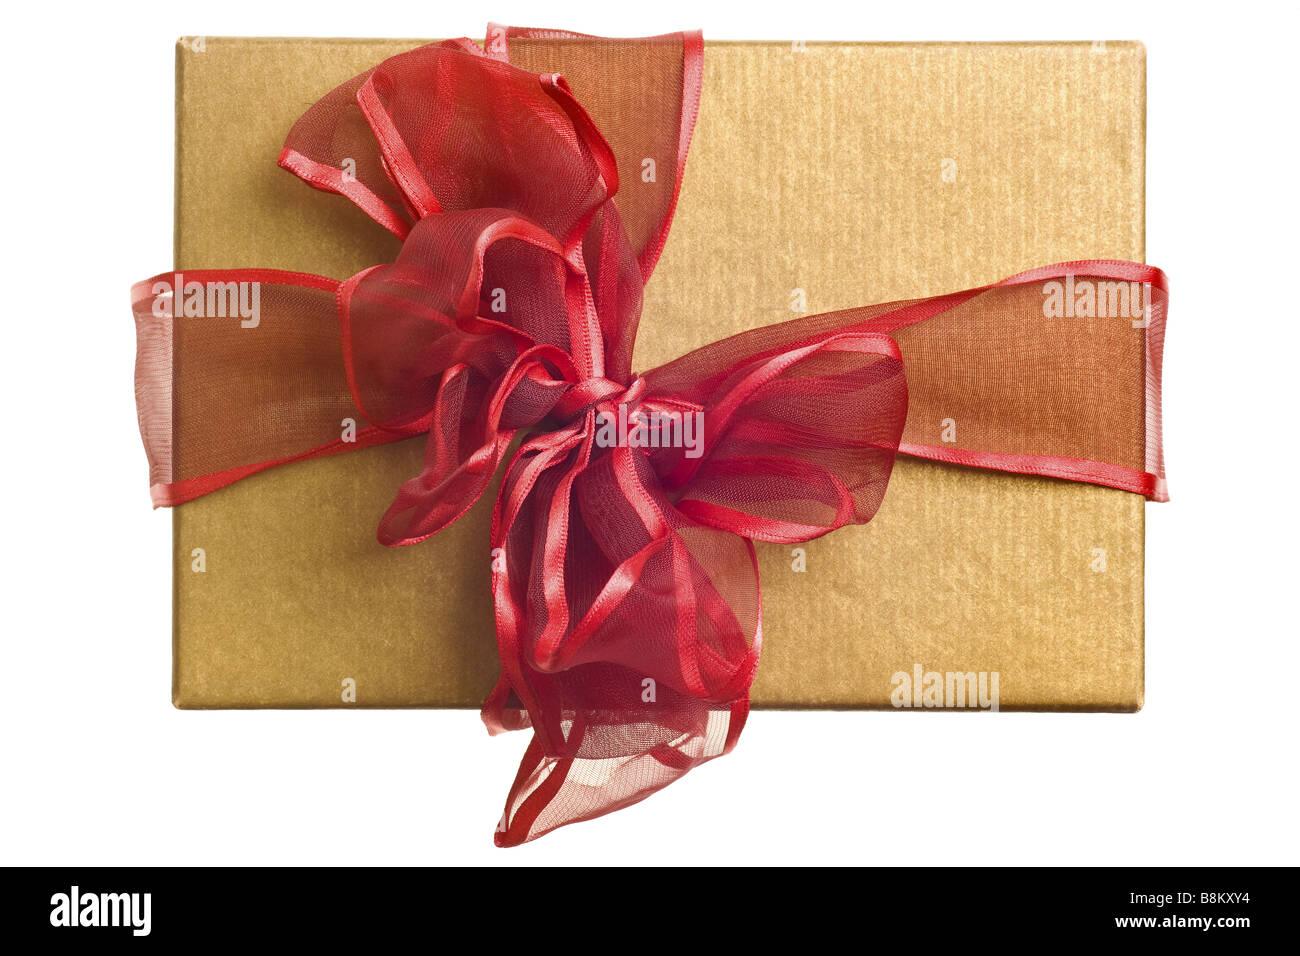 Oro regalo con lazo rojo aislado sobre fondo blanco. Imagen De Stock